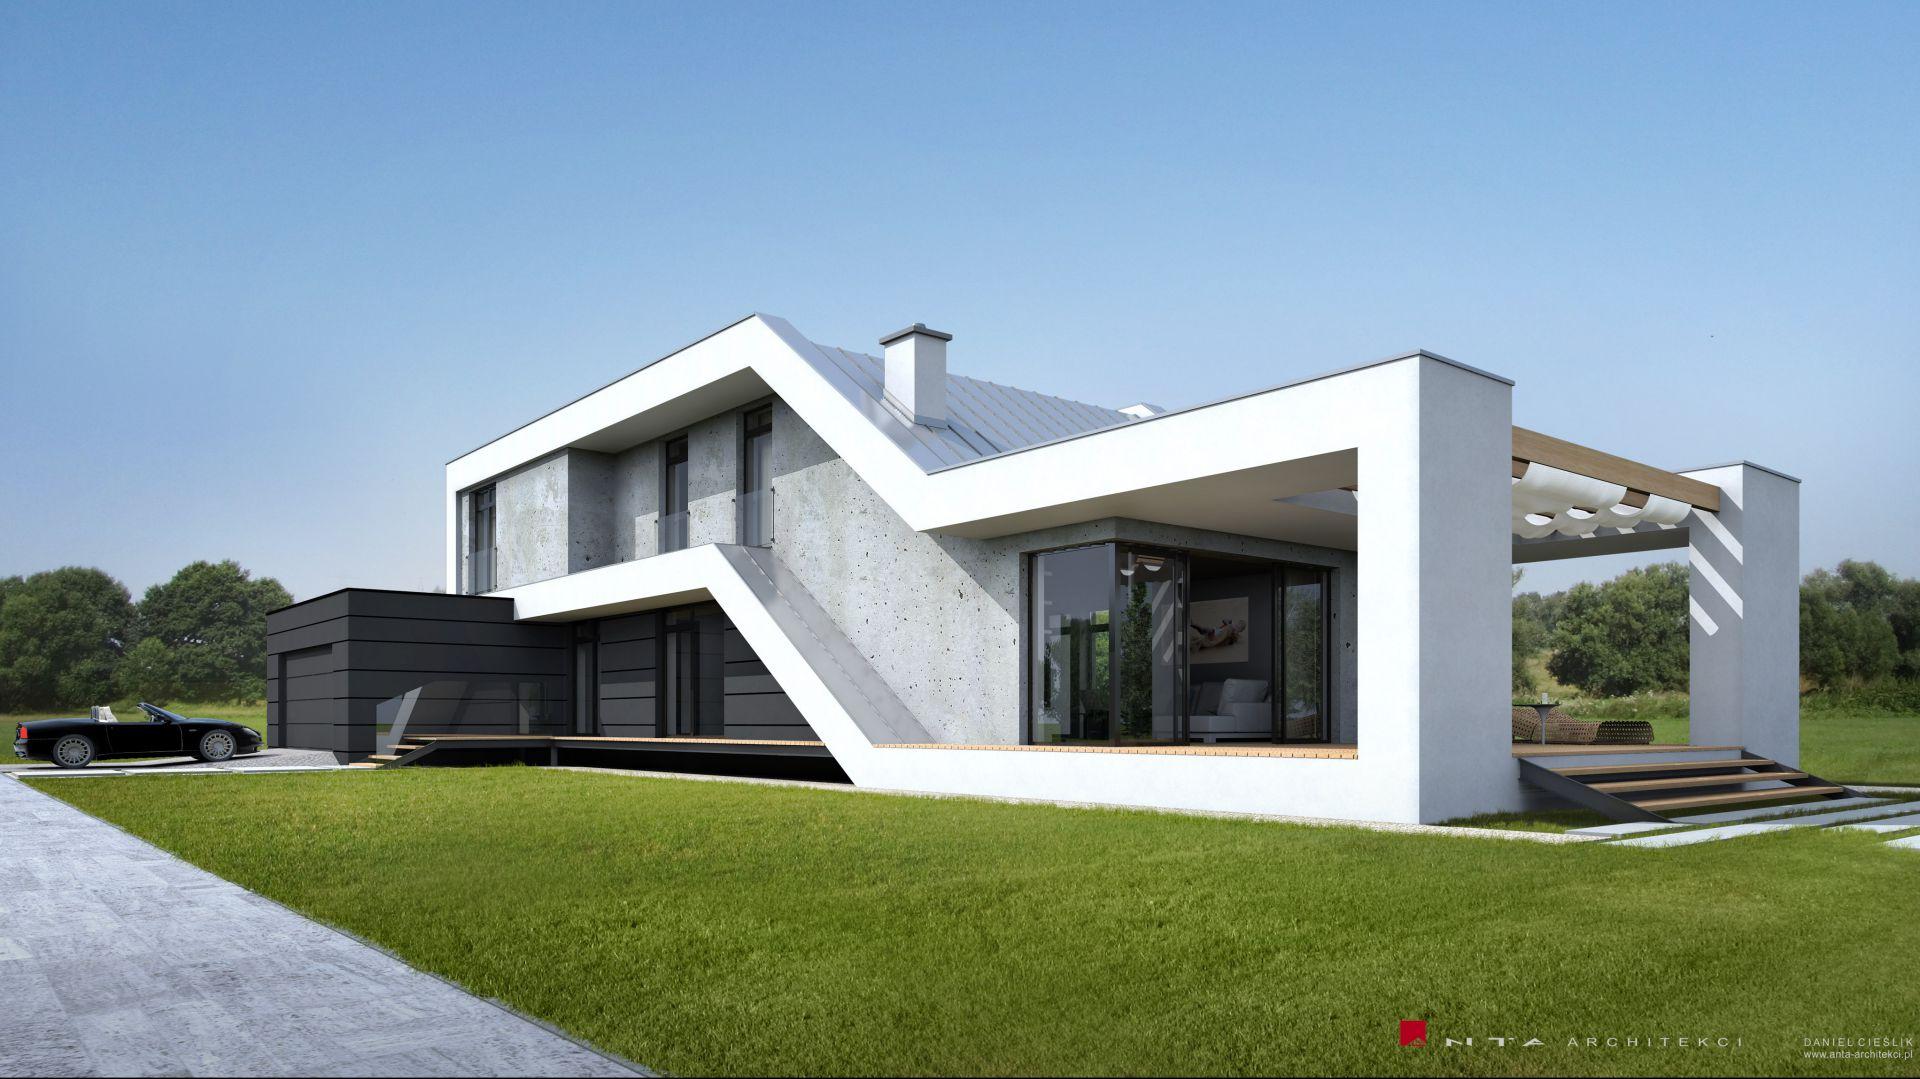 ANTA-B1 - Projekt Roku 2013 kat. Domy Nowoczesne.